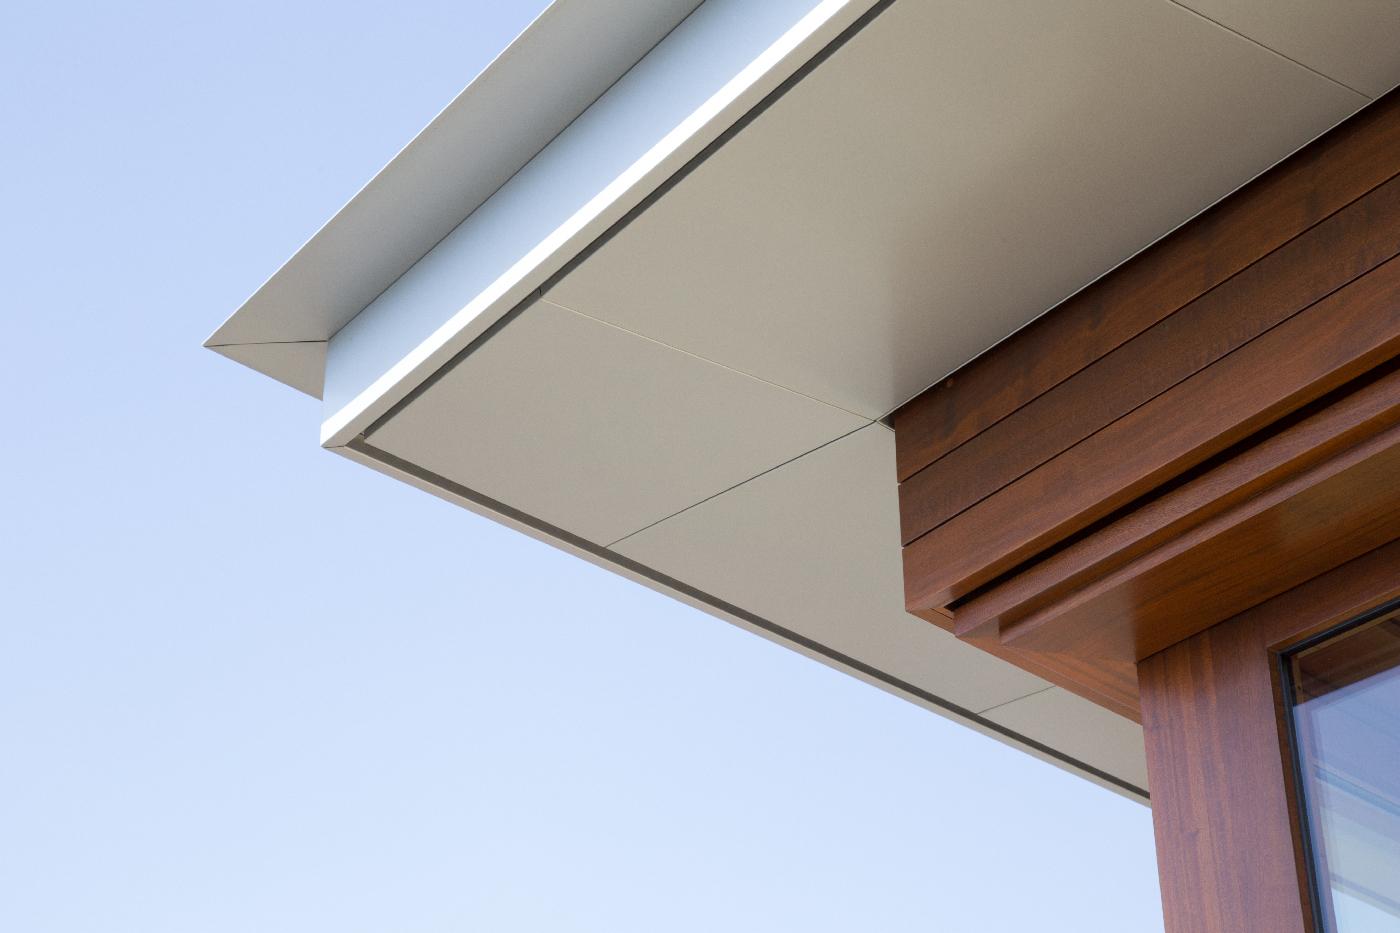 detail_exterior-fascia.jpg